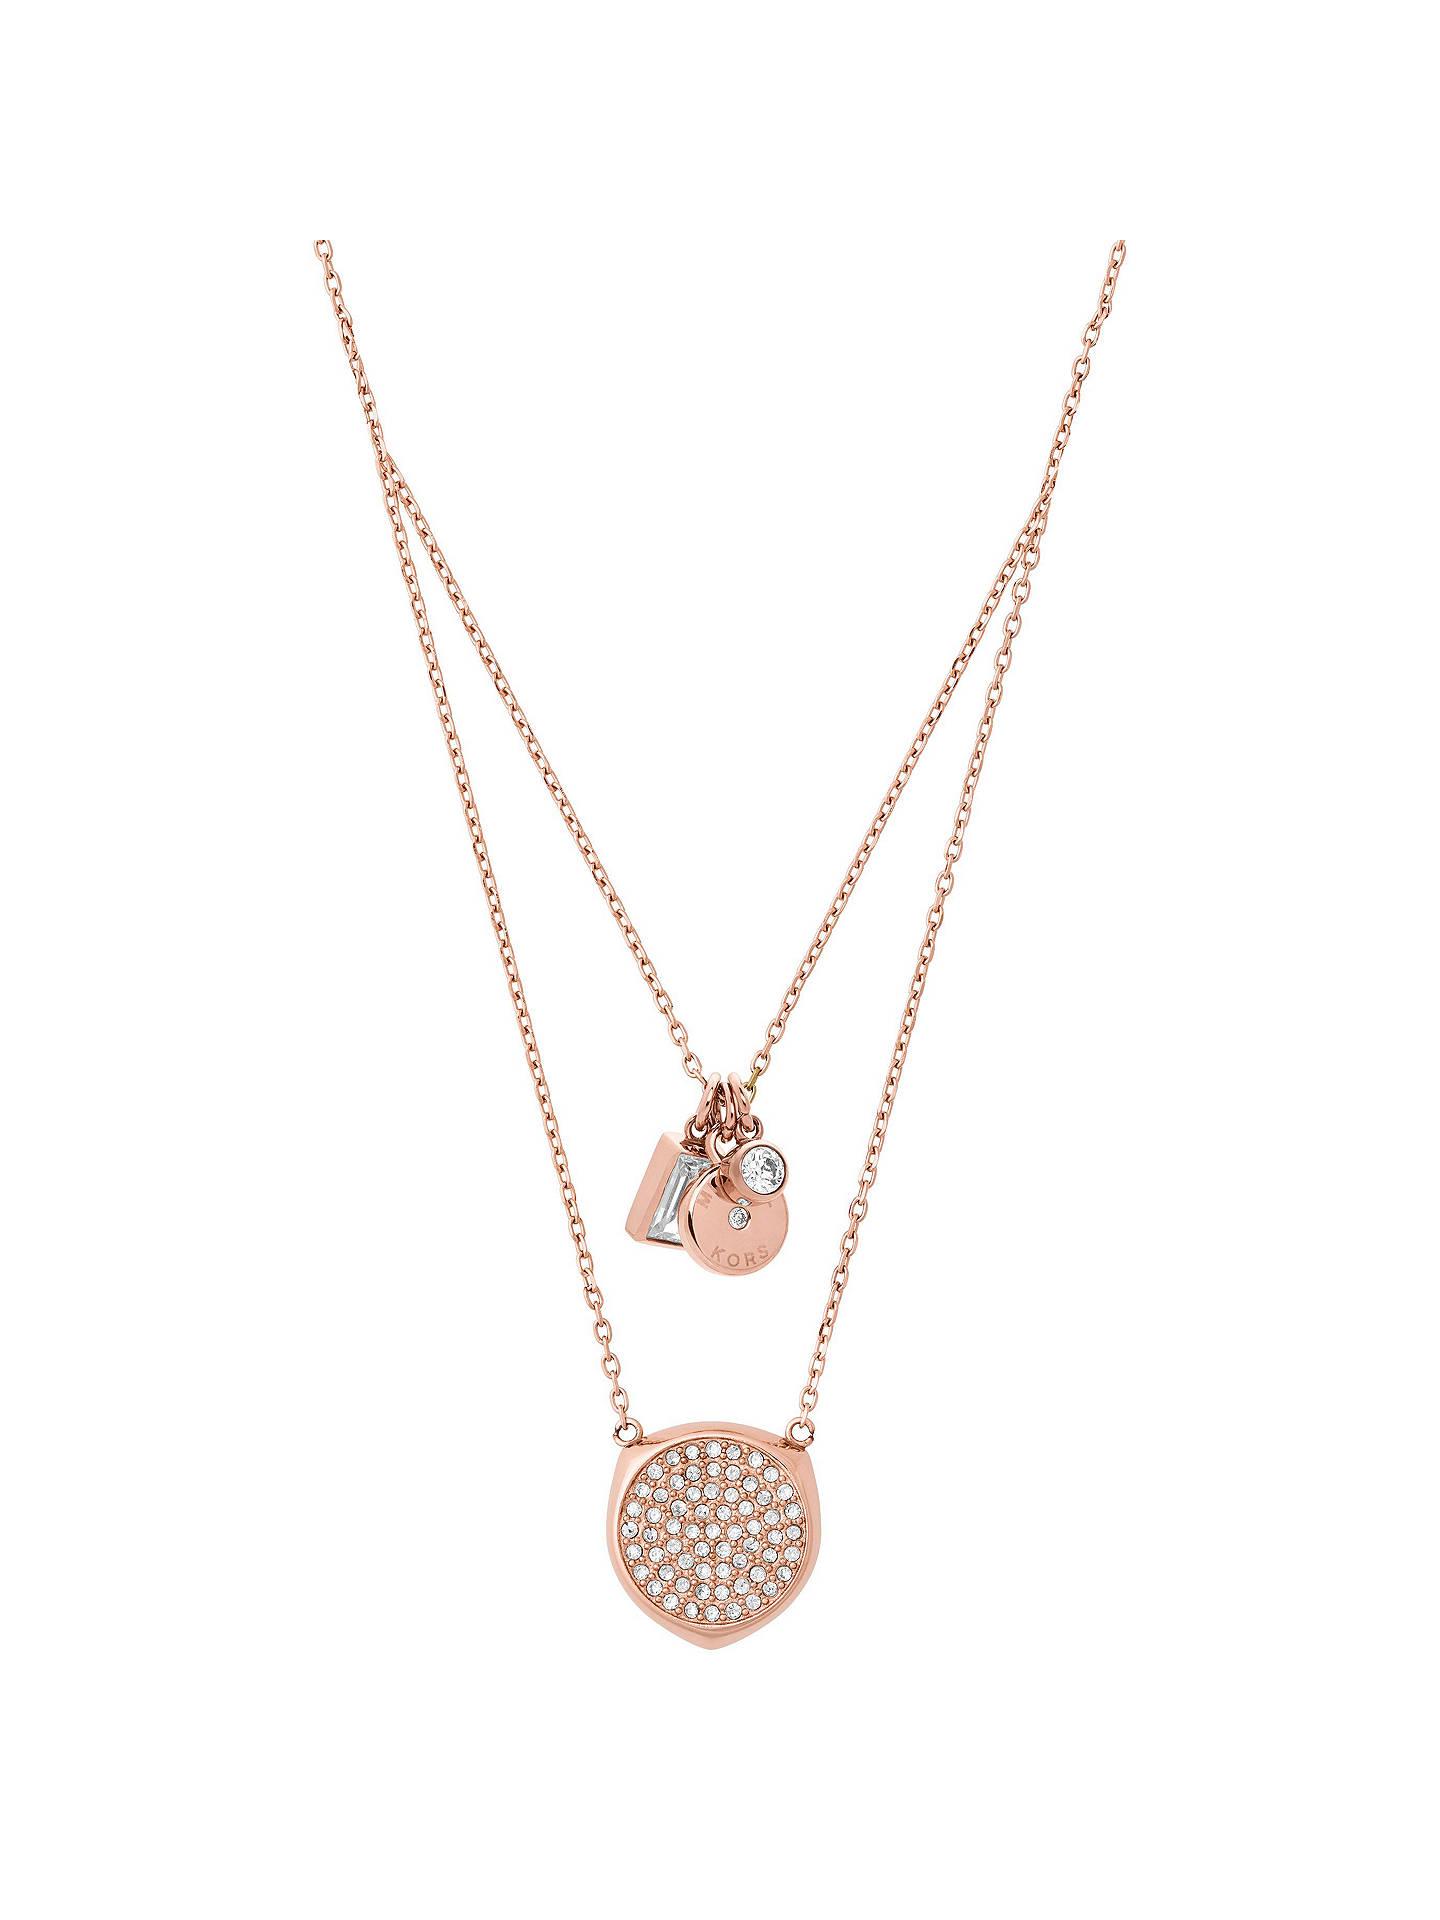 BuyMichael Kors V Drop Cubic Zirconia Charm Pendant Necklace 248f8efddf3e